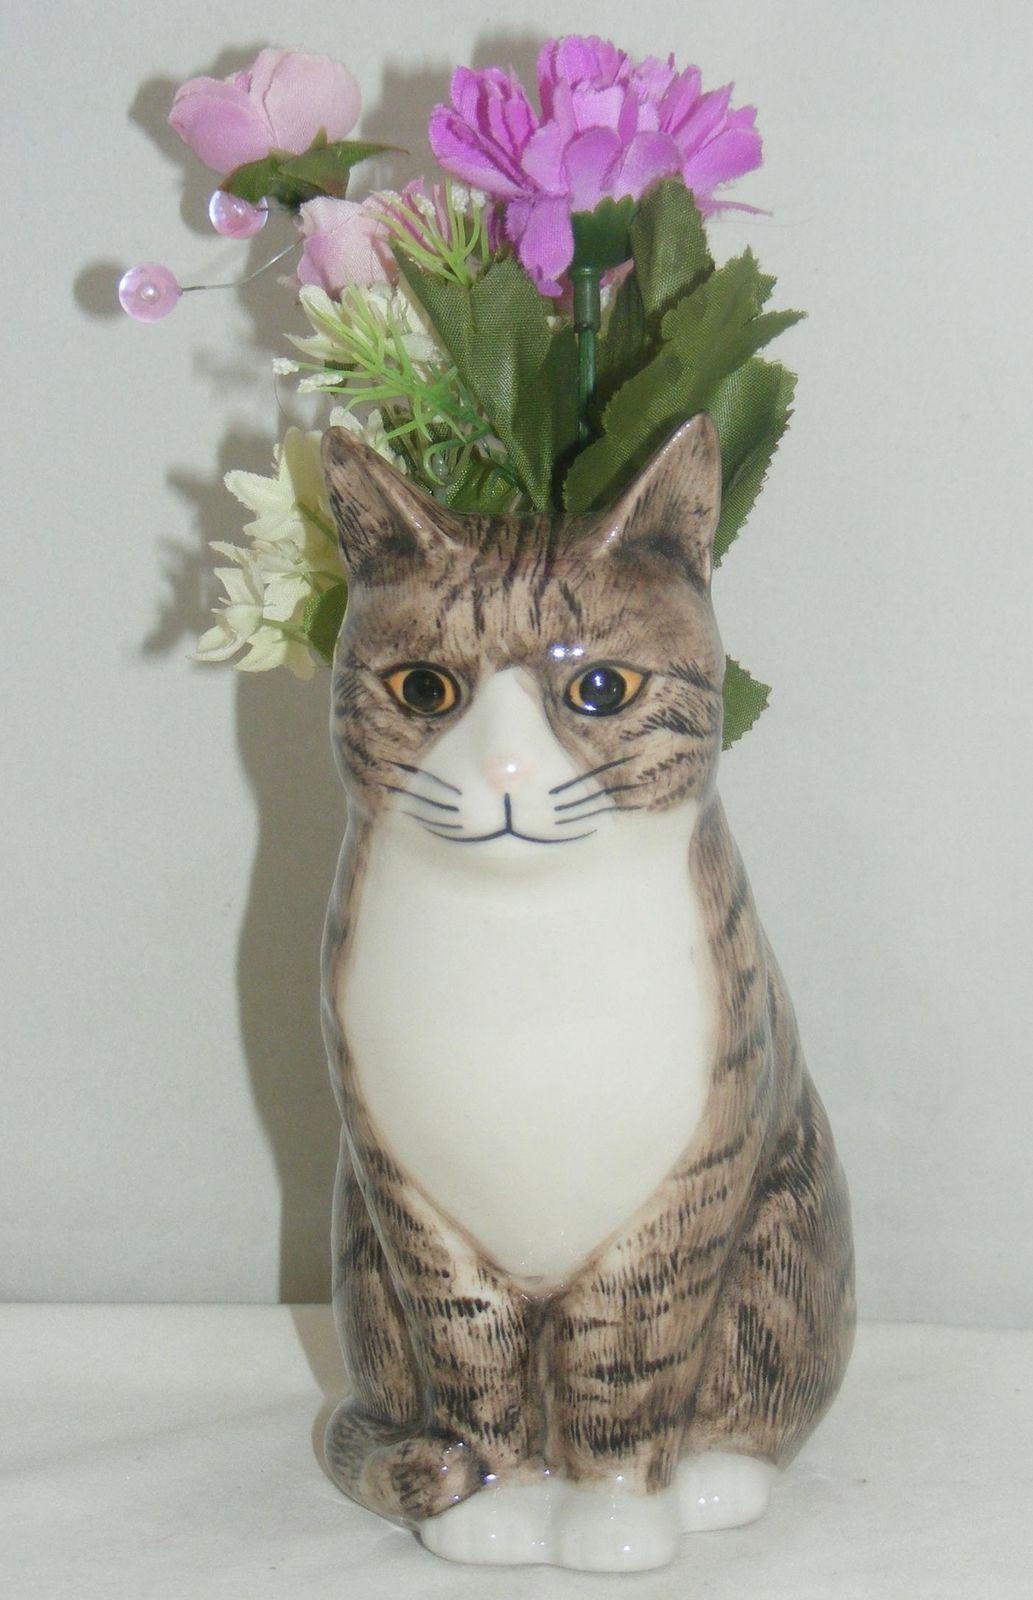 Quail ceramics moggy cat flower vase millie small 970 flower quail ceramics moggy cat flower vase millie small 970 reviewsmspy